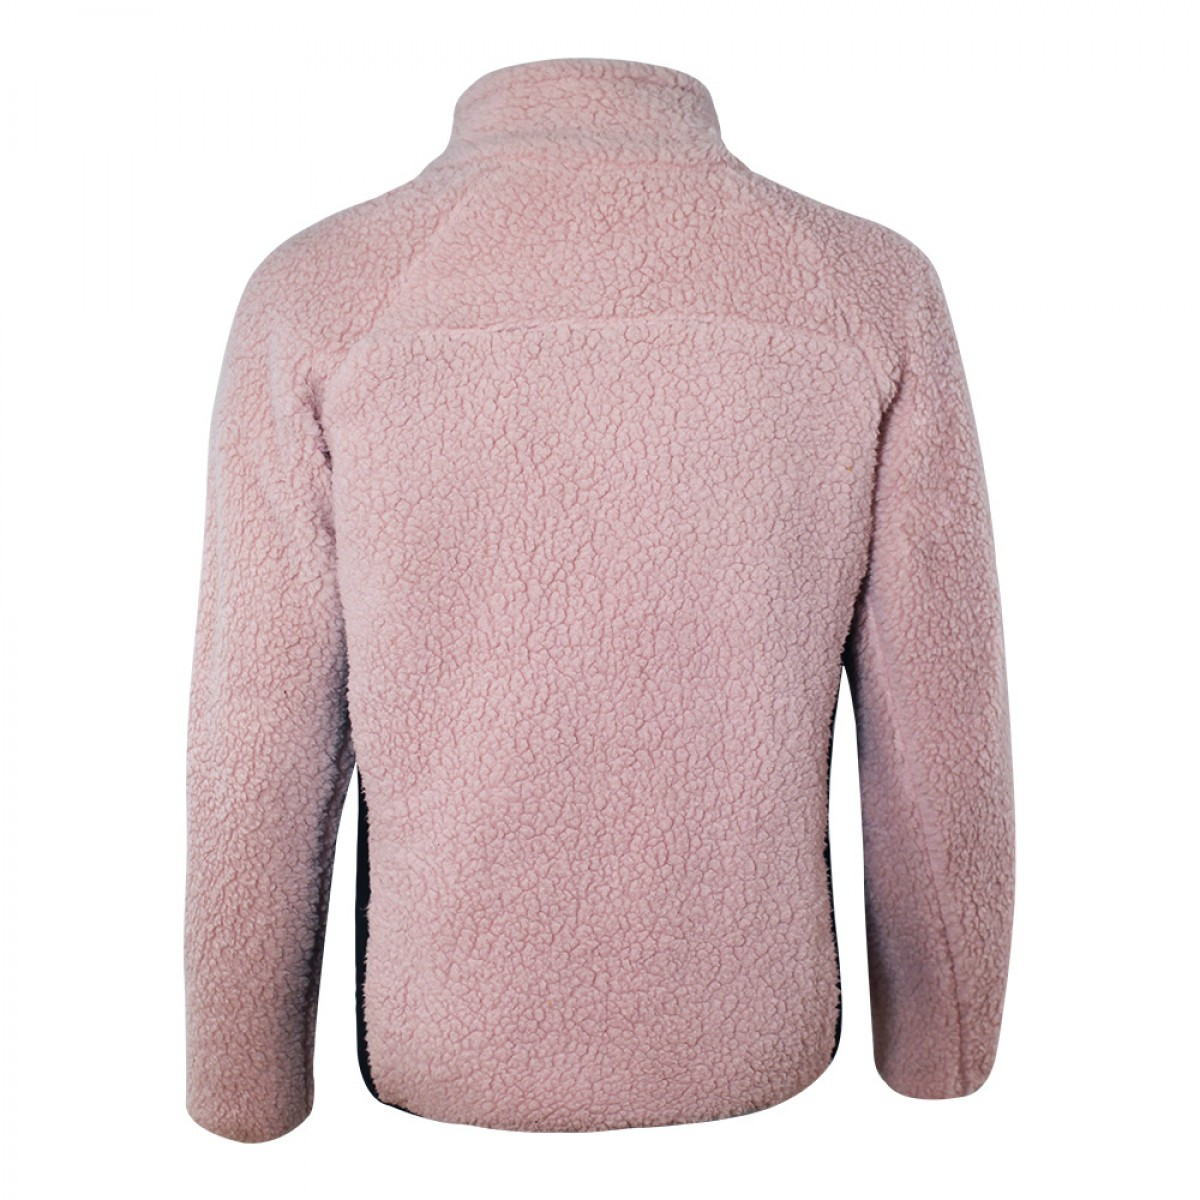 women-thick-sheep-jacketksj06924-2a